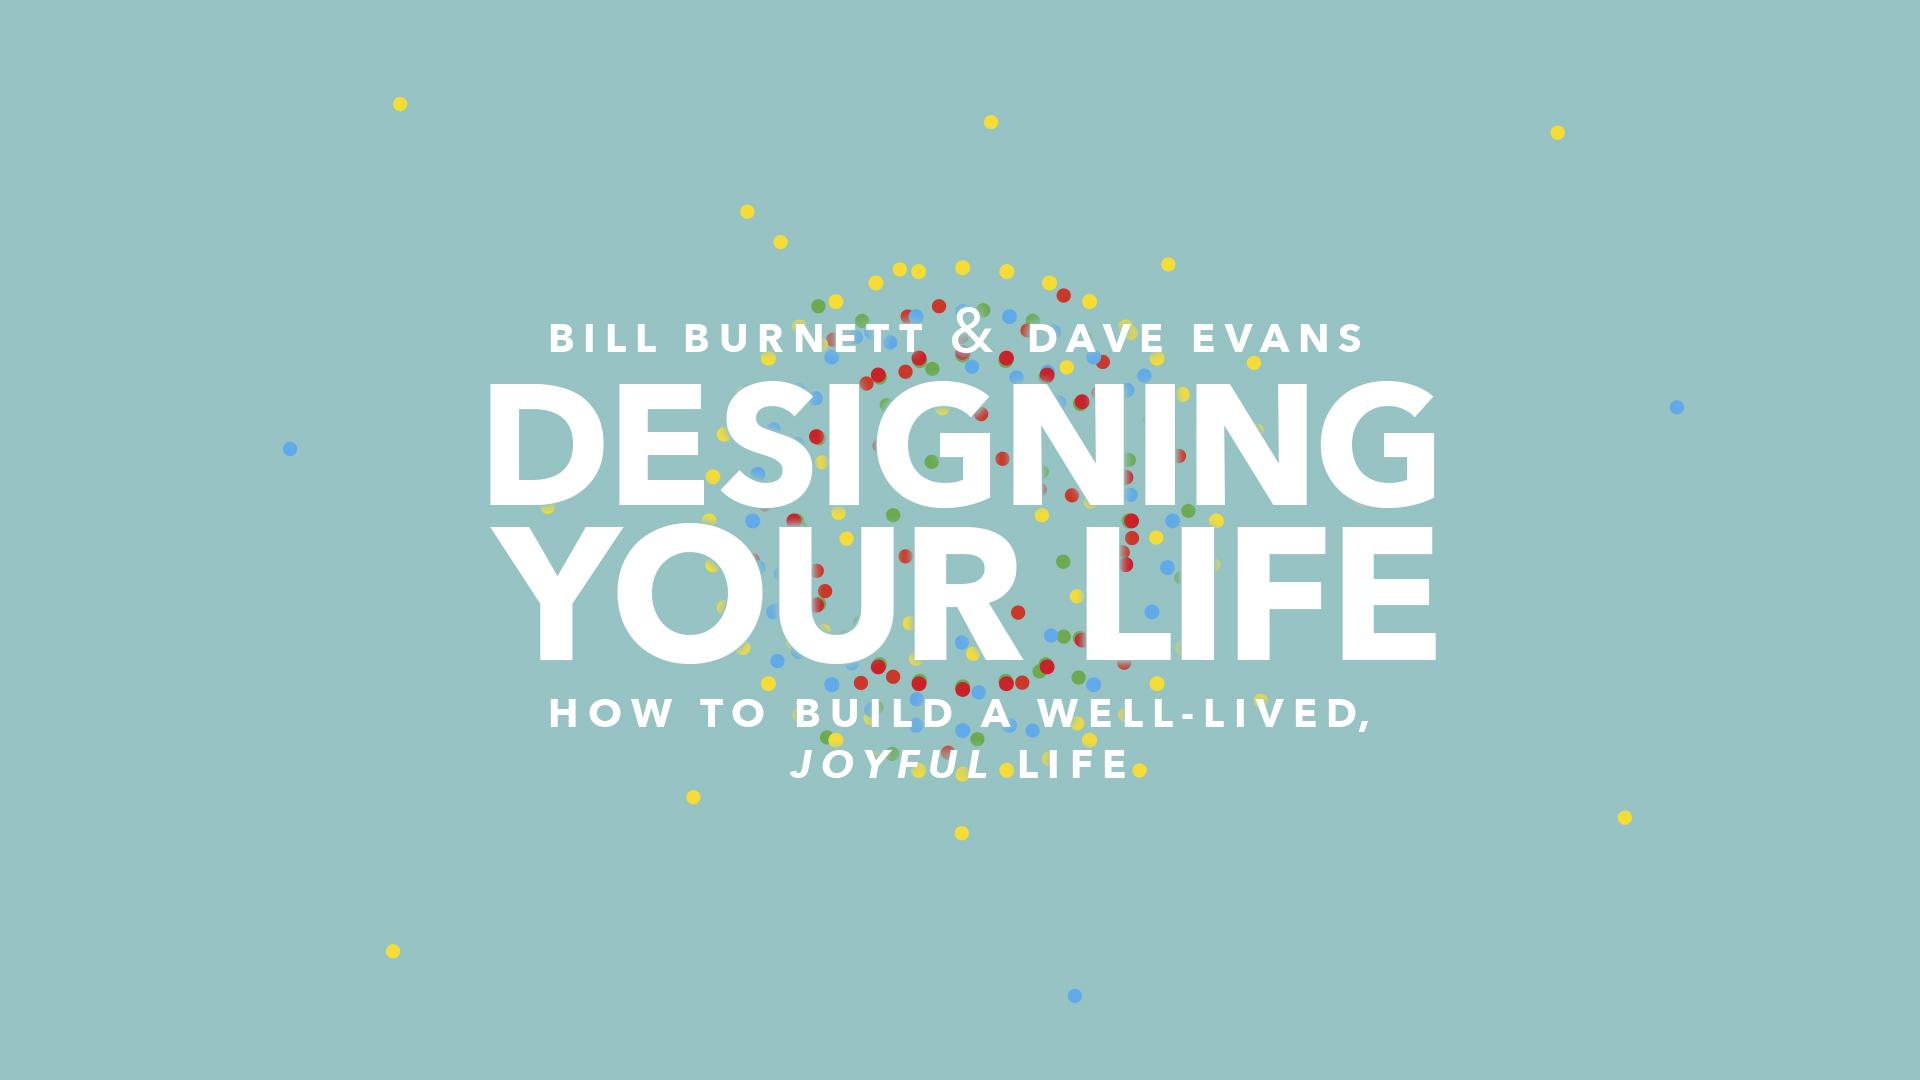 Designingyour.life